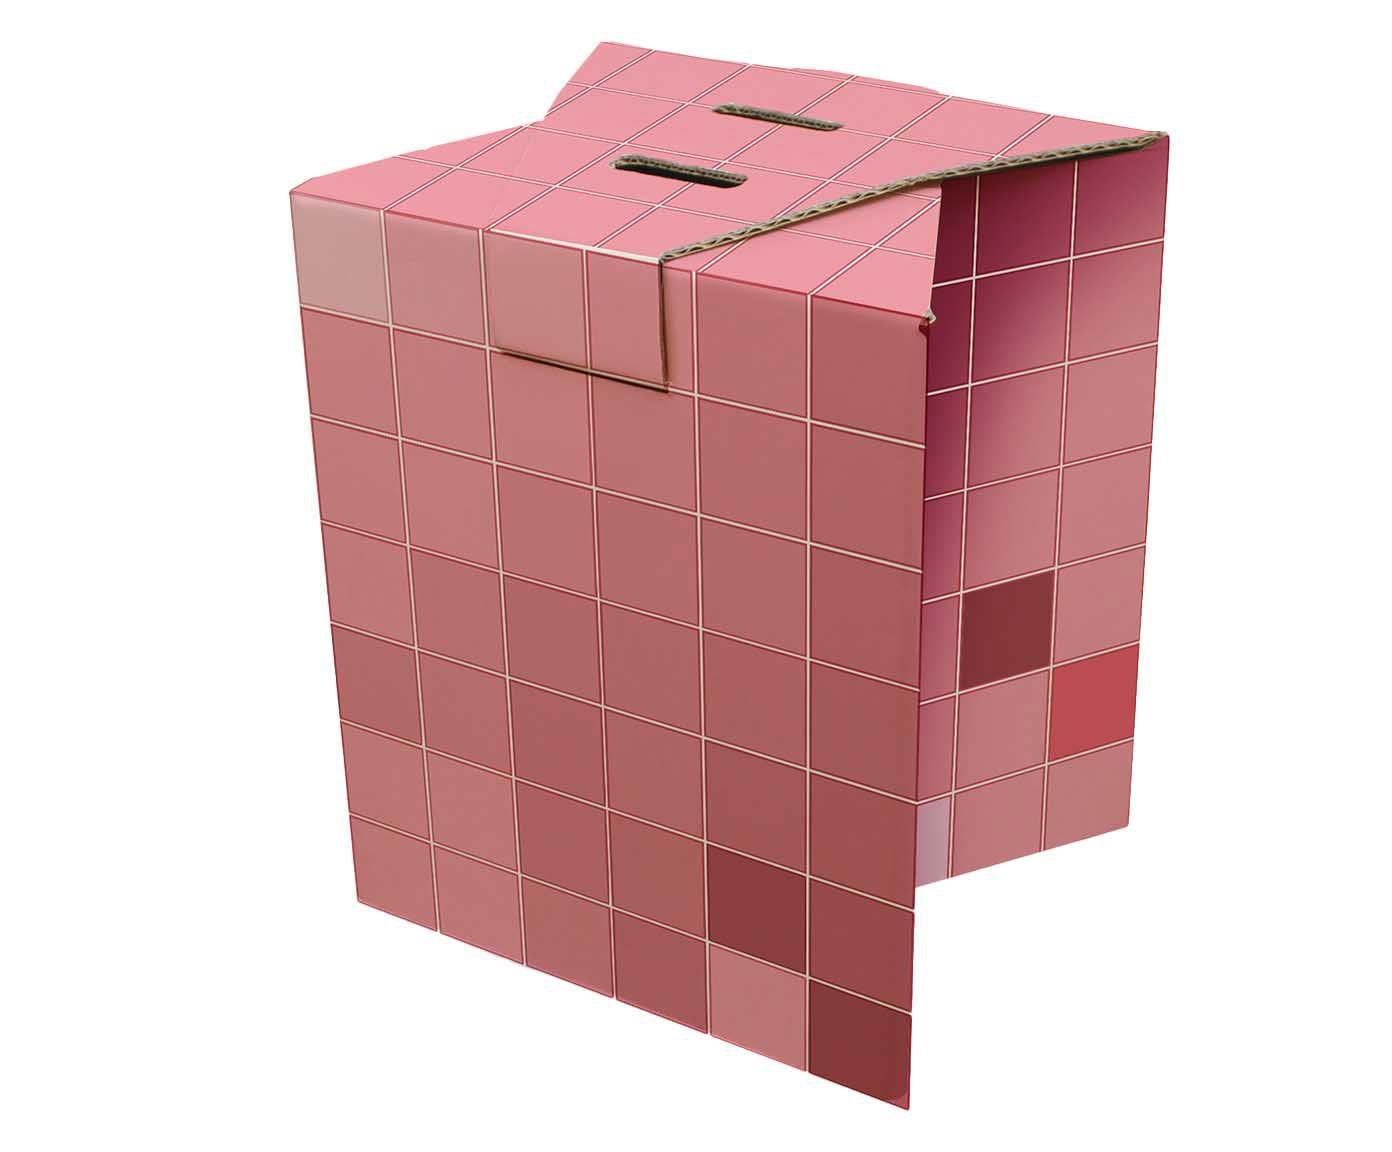 Banco rube cube - rama | Westwing.com.br